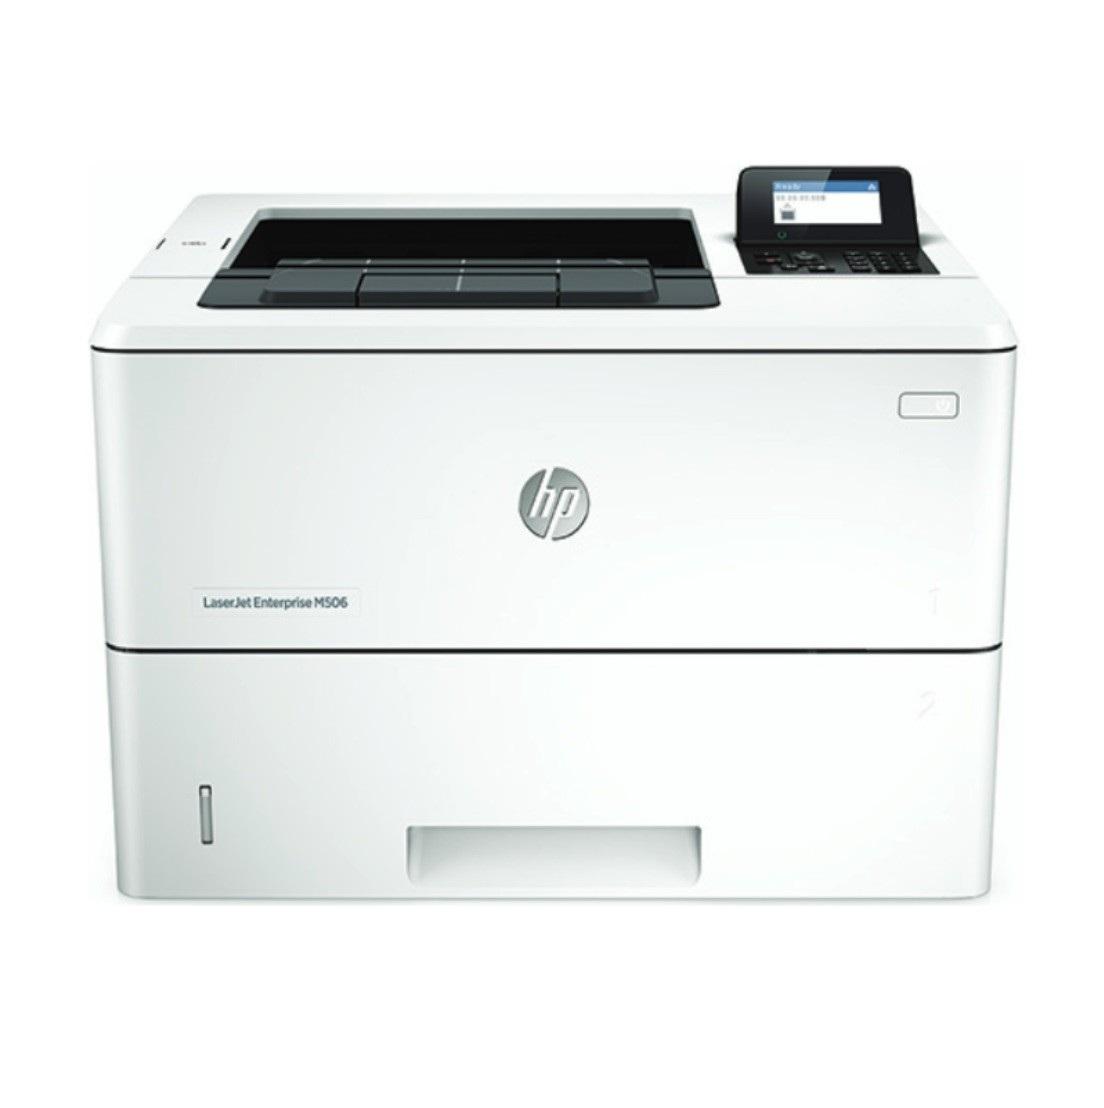 Máy in laser đen trắng HP M506DN-F2A69A